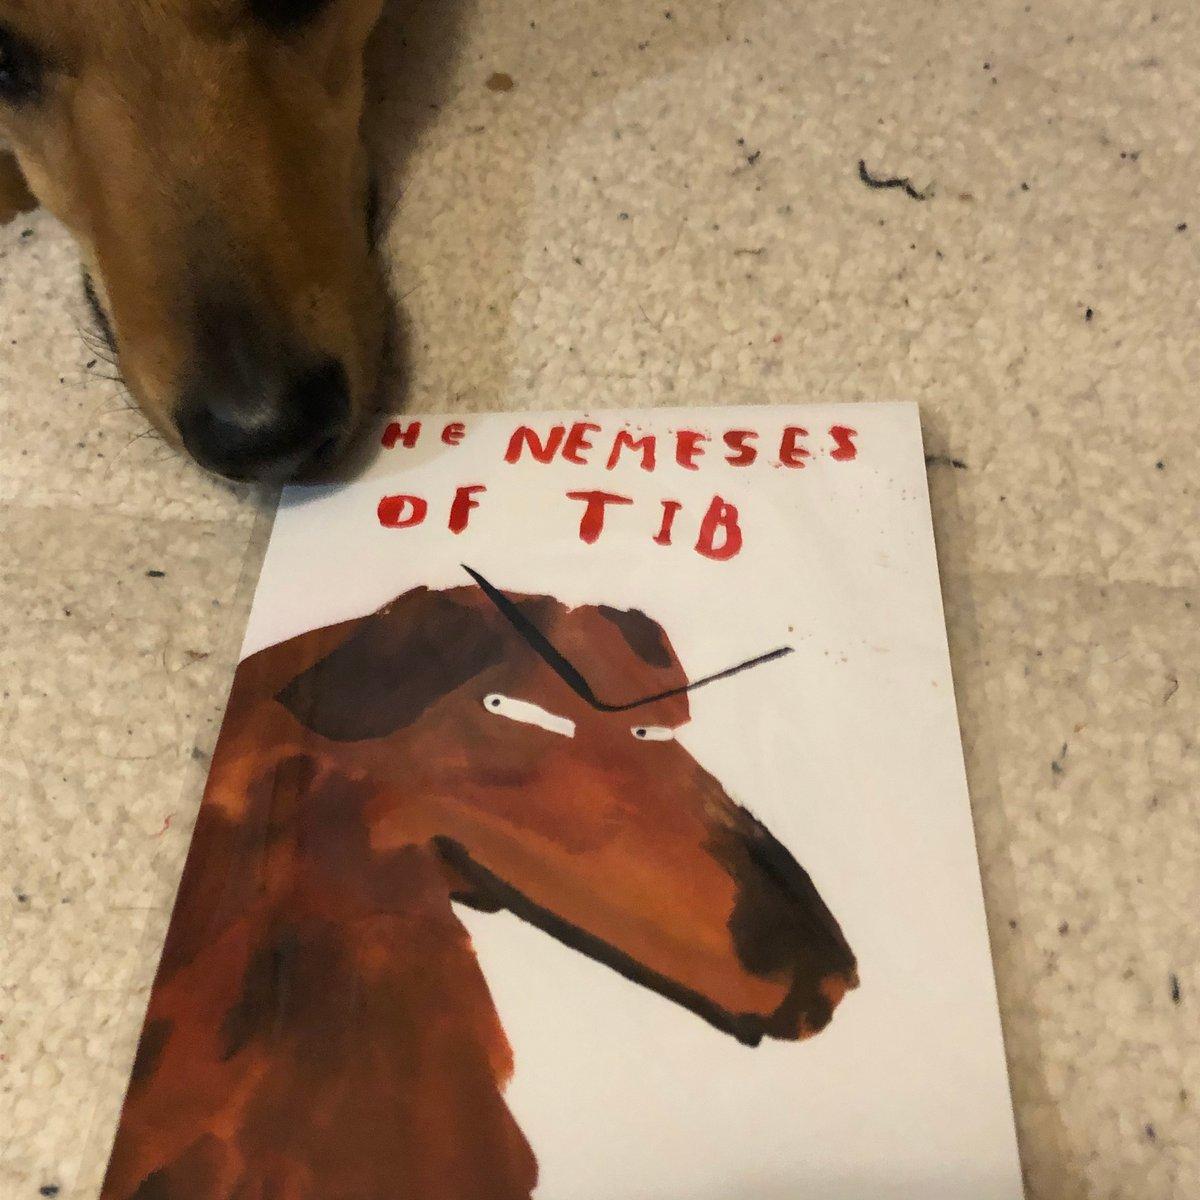 The Nemeses of Tib (comic)